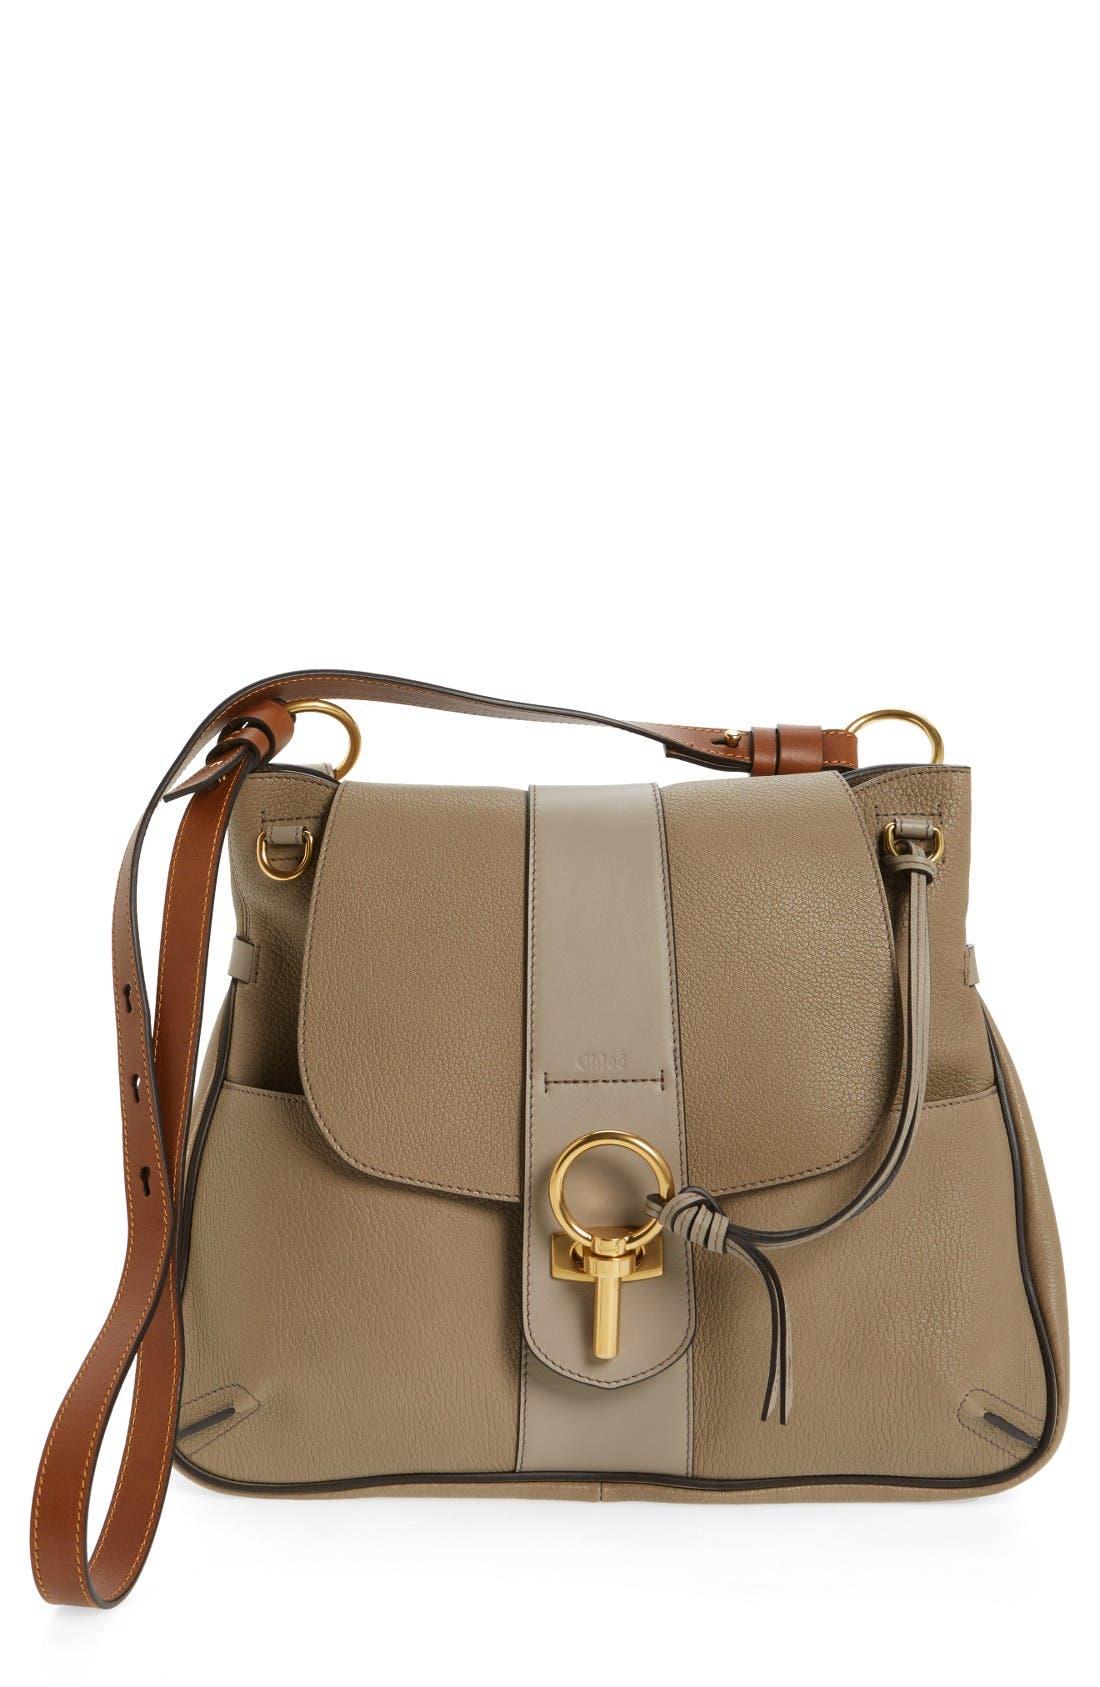 CHLOÉ Medium Lexa Leather Shoulder Bag